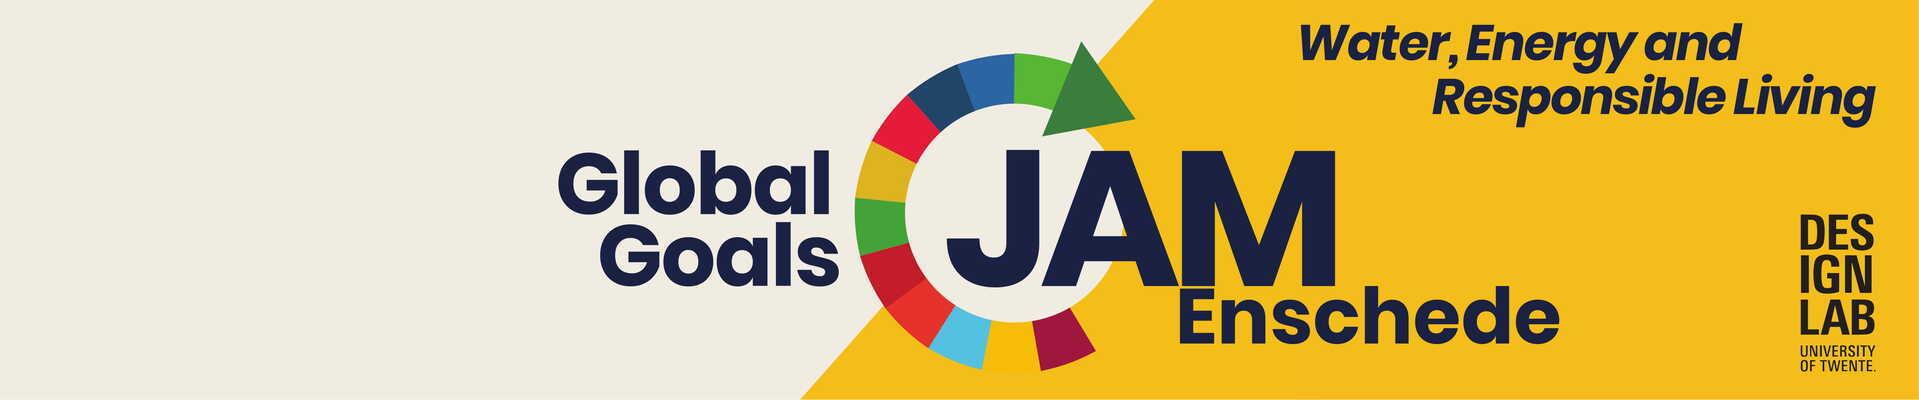 Global Goals Jam Enschede 2019